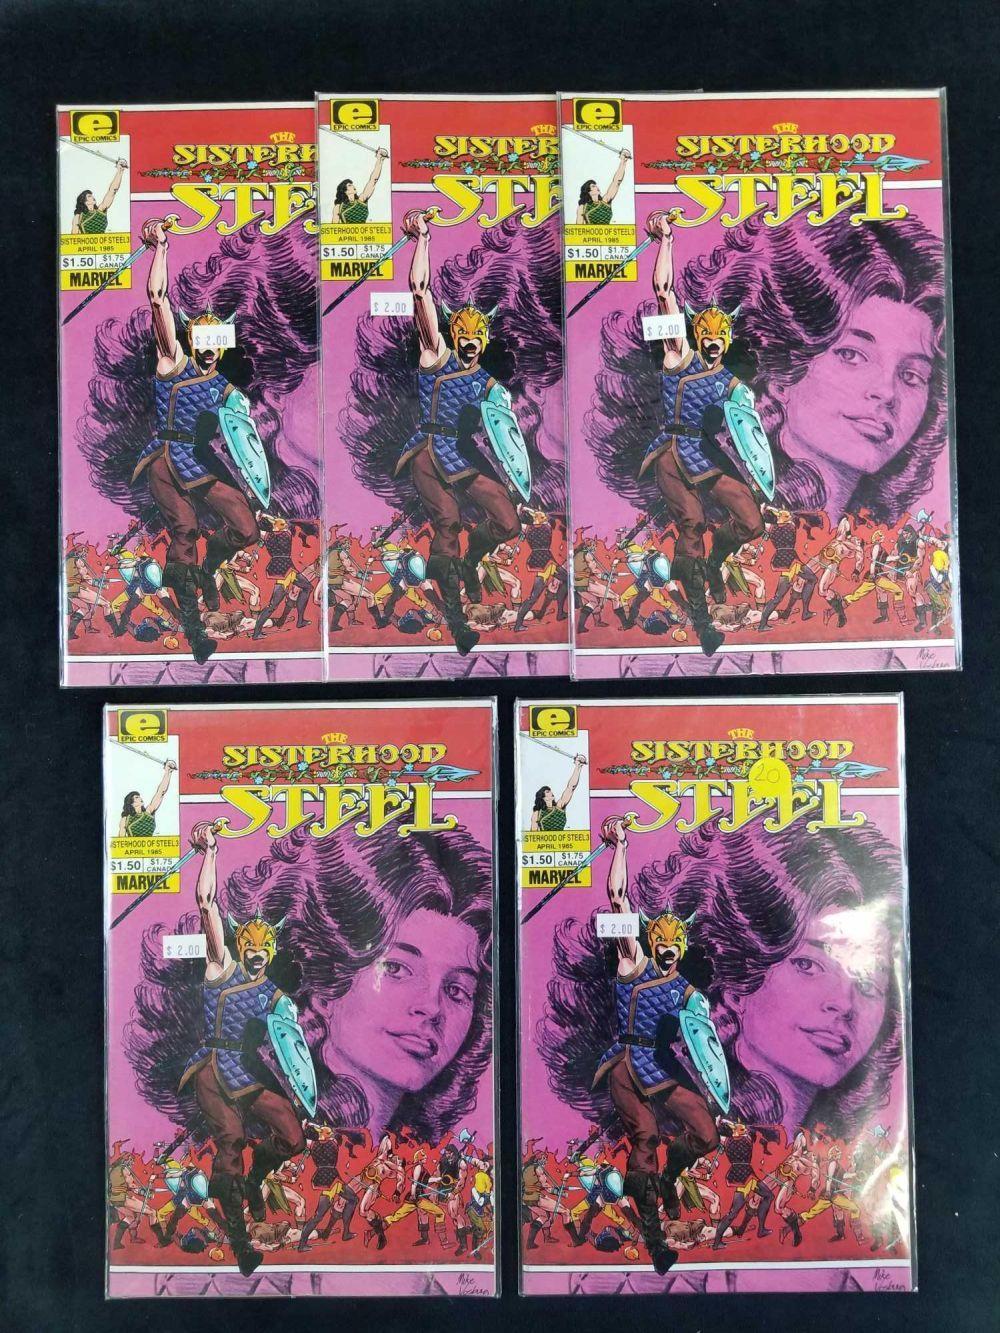 Lot 64: Lot of 14 The Sisterhood Steel Comics